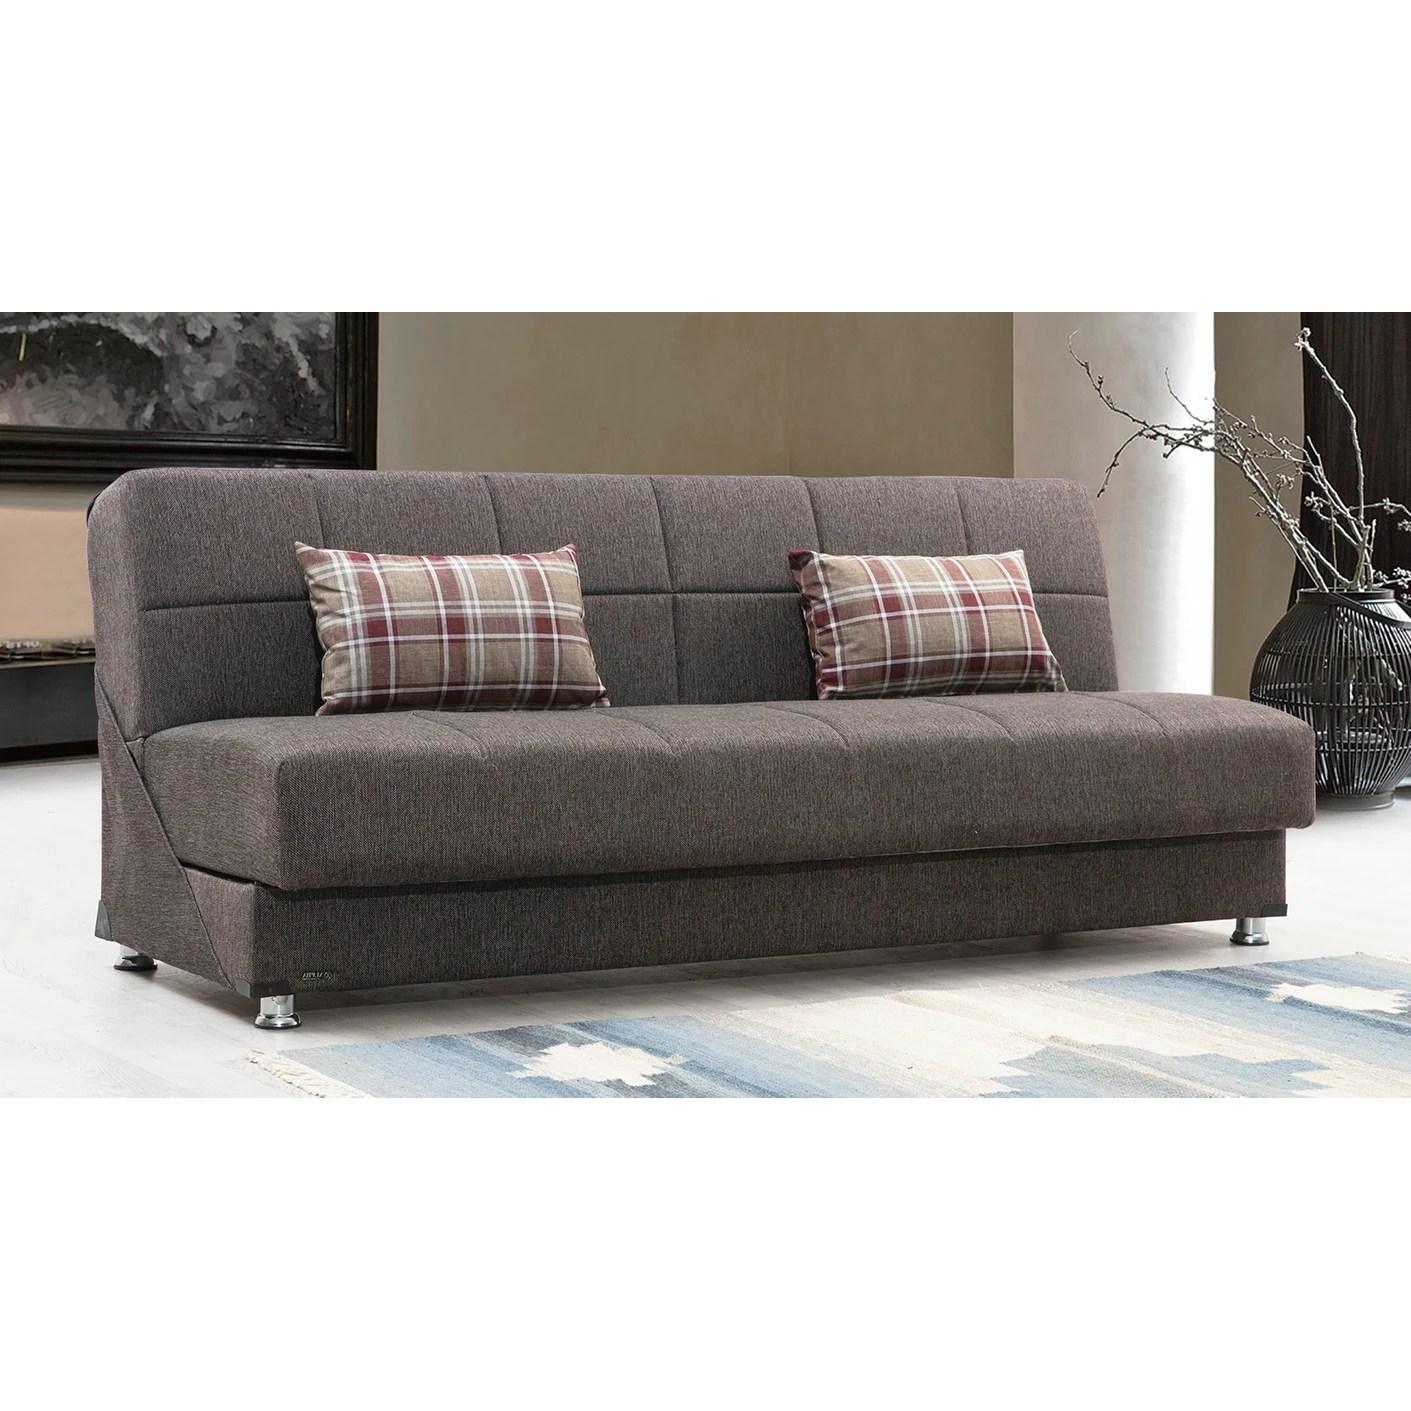 oxnard brown fabric armless convertible sleeper sofa with storage